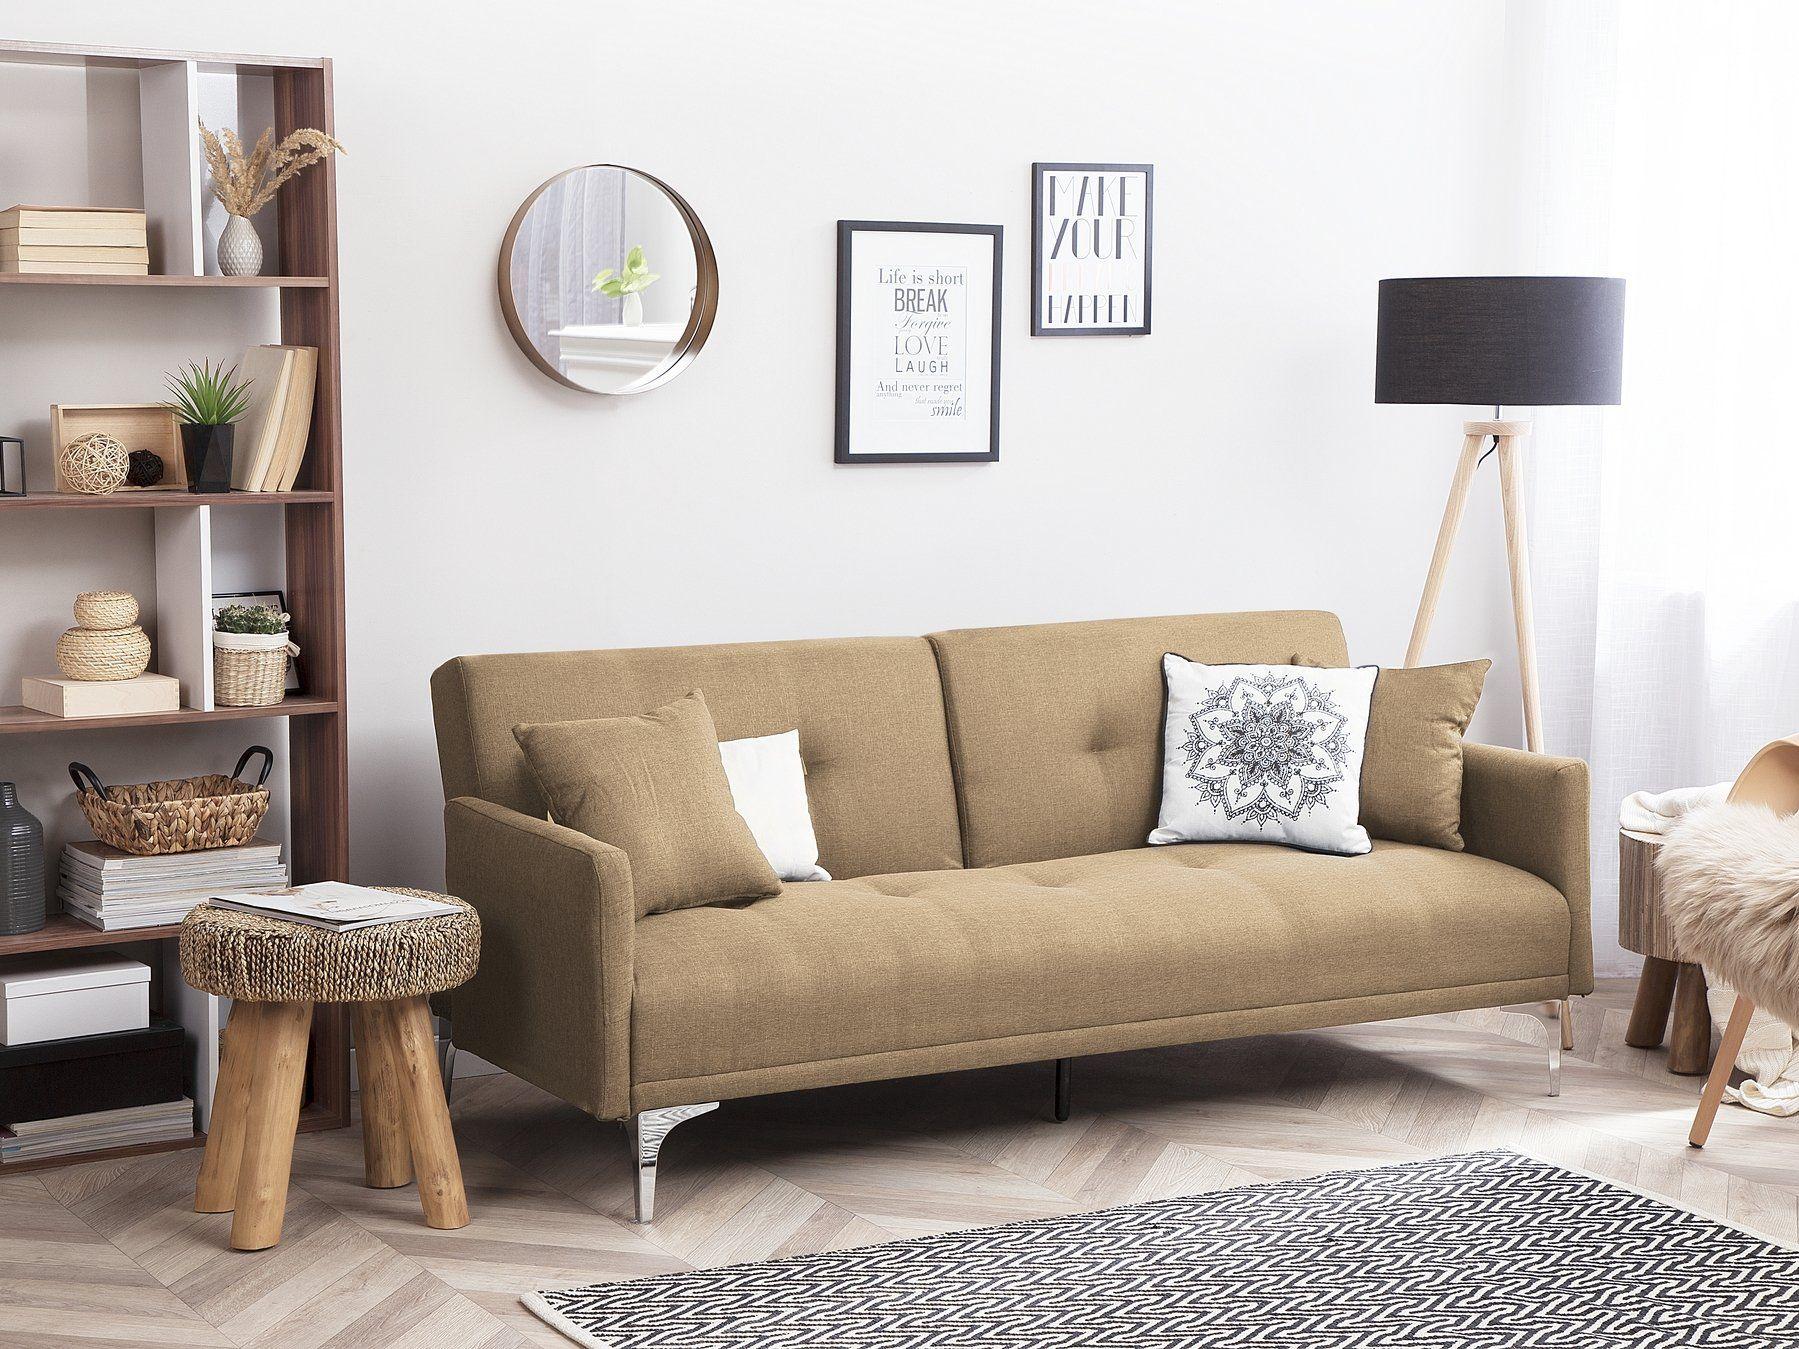 Stehlampe Schwarz 140 Cm Nitra Traditional Living Room Furniture Fabric Sofa Living Room Sofa